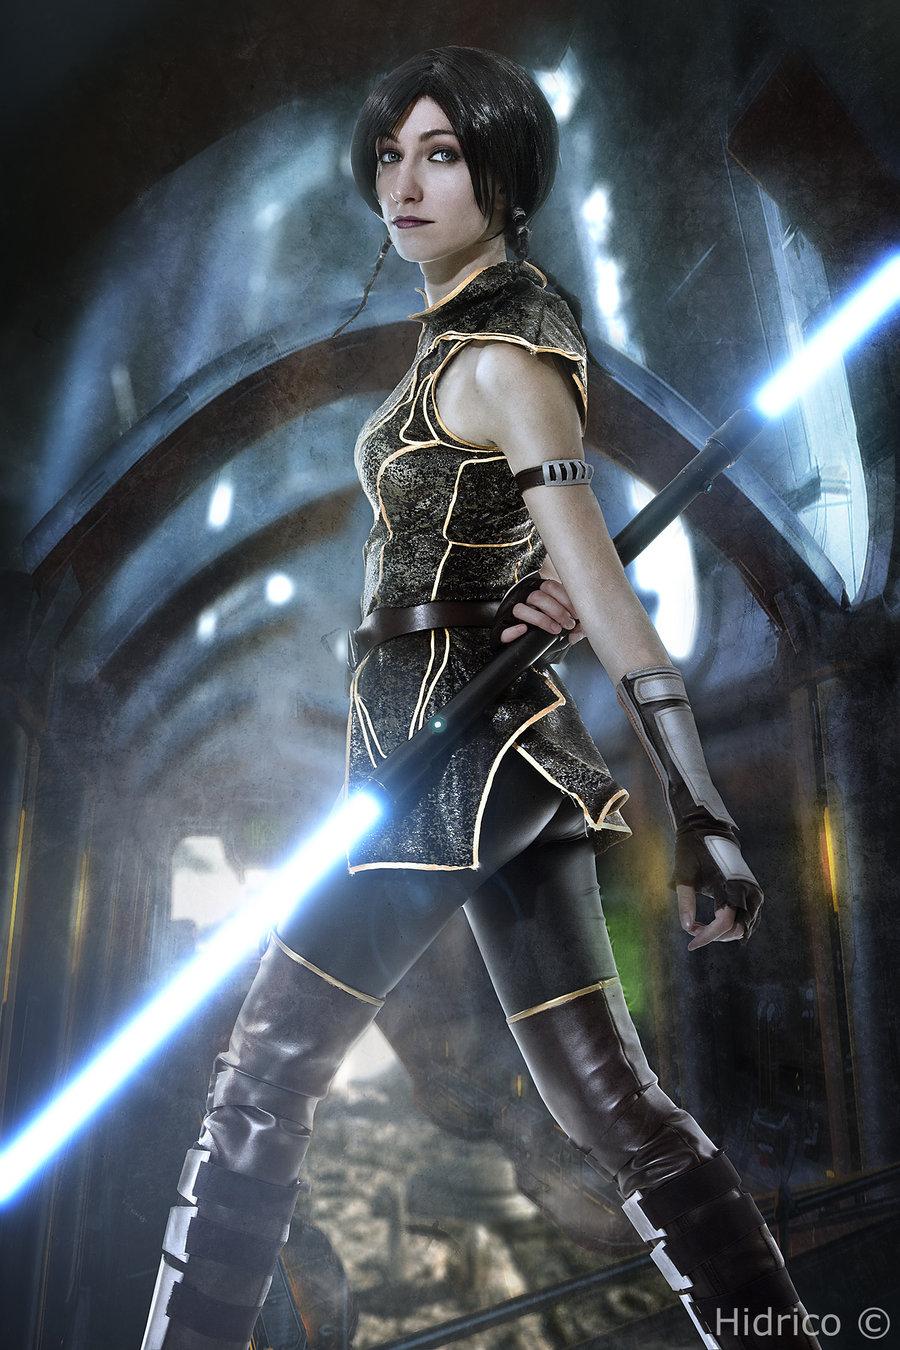 Star wars sexy jedi girls cosplay that